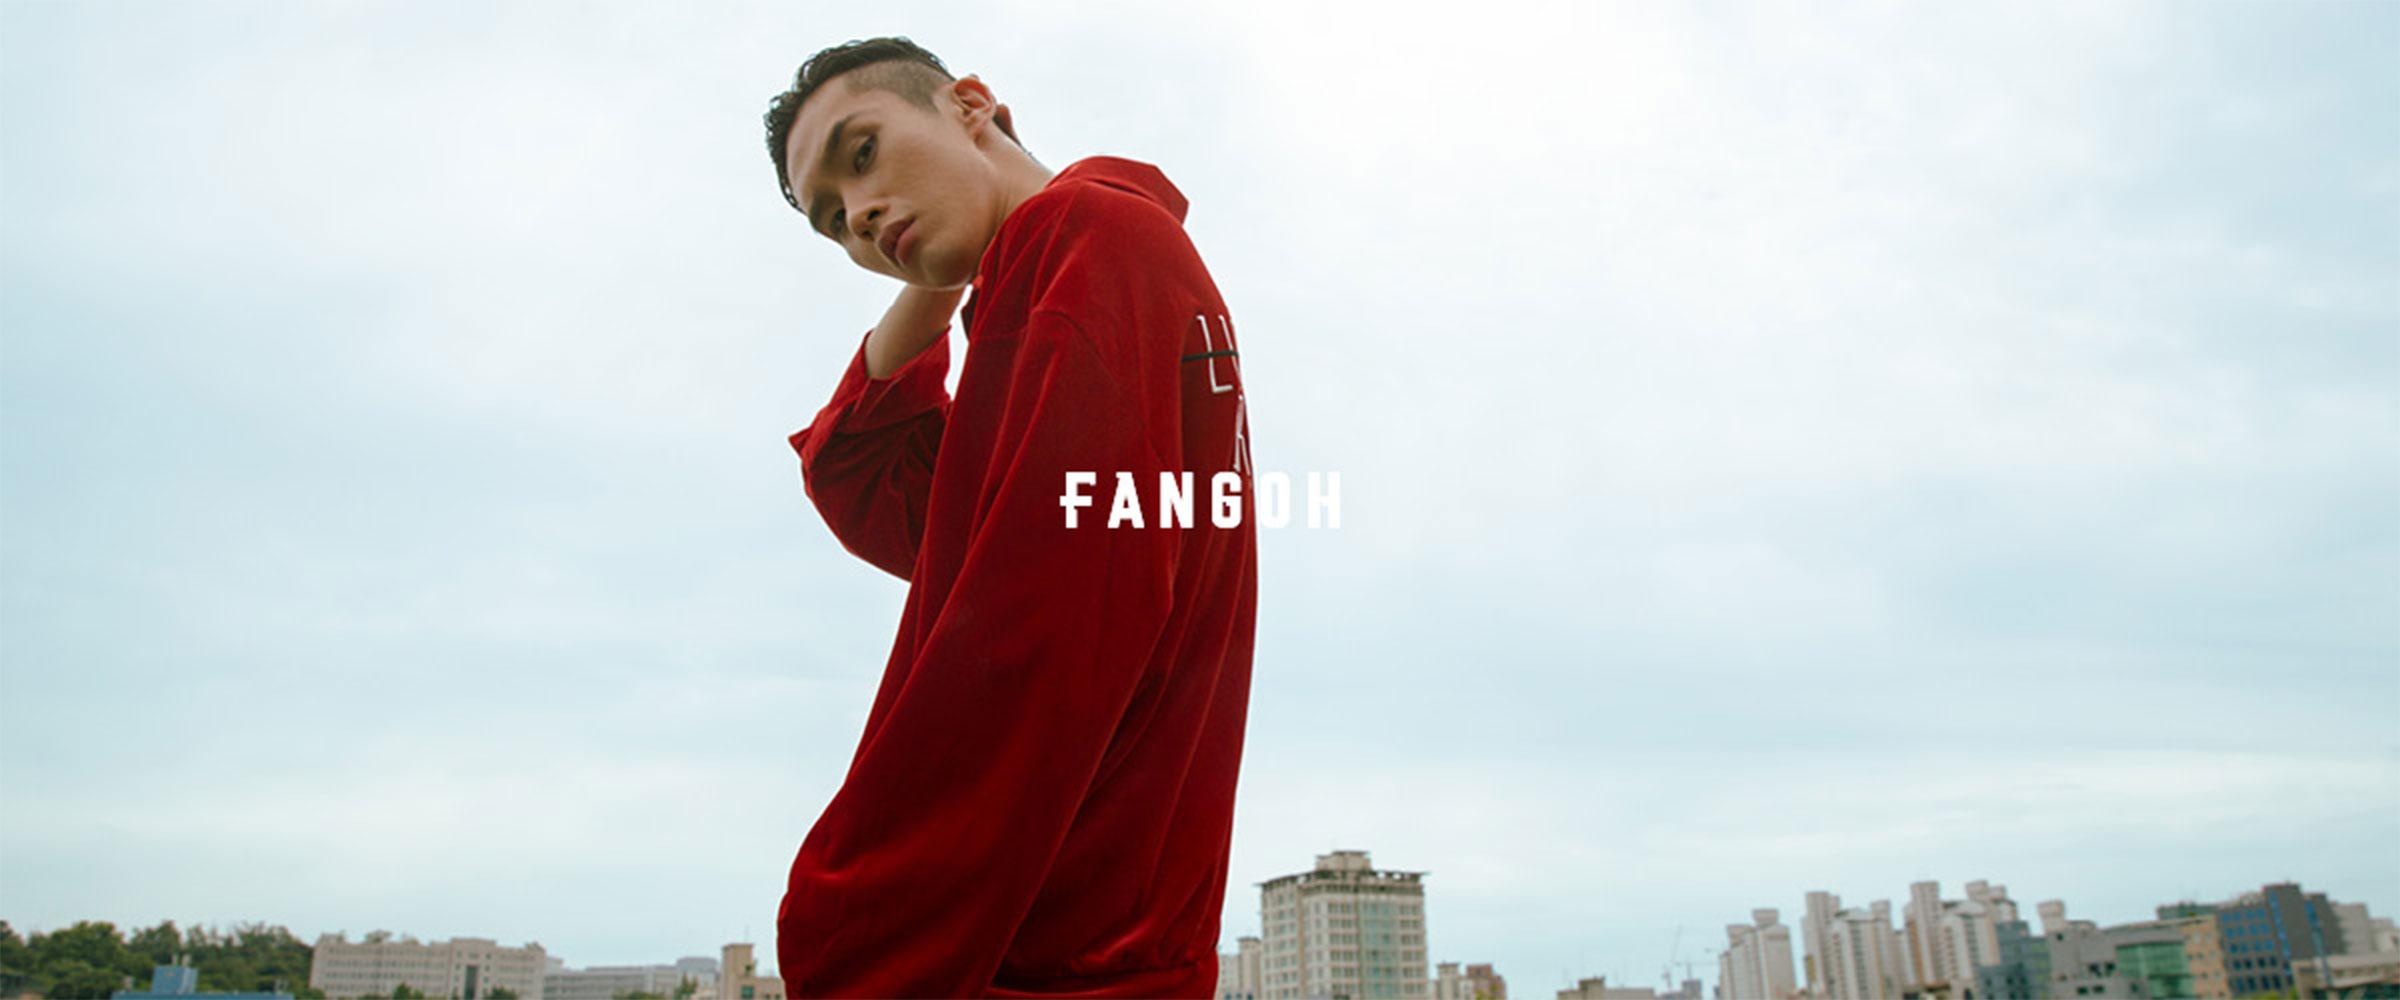 fangoh.jpg